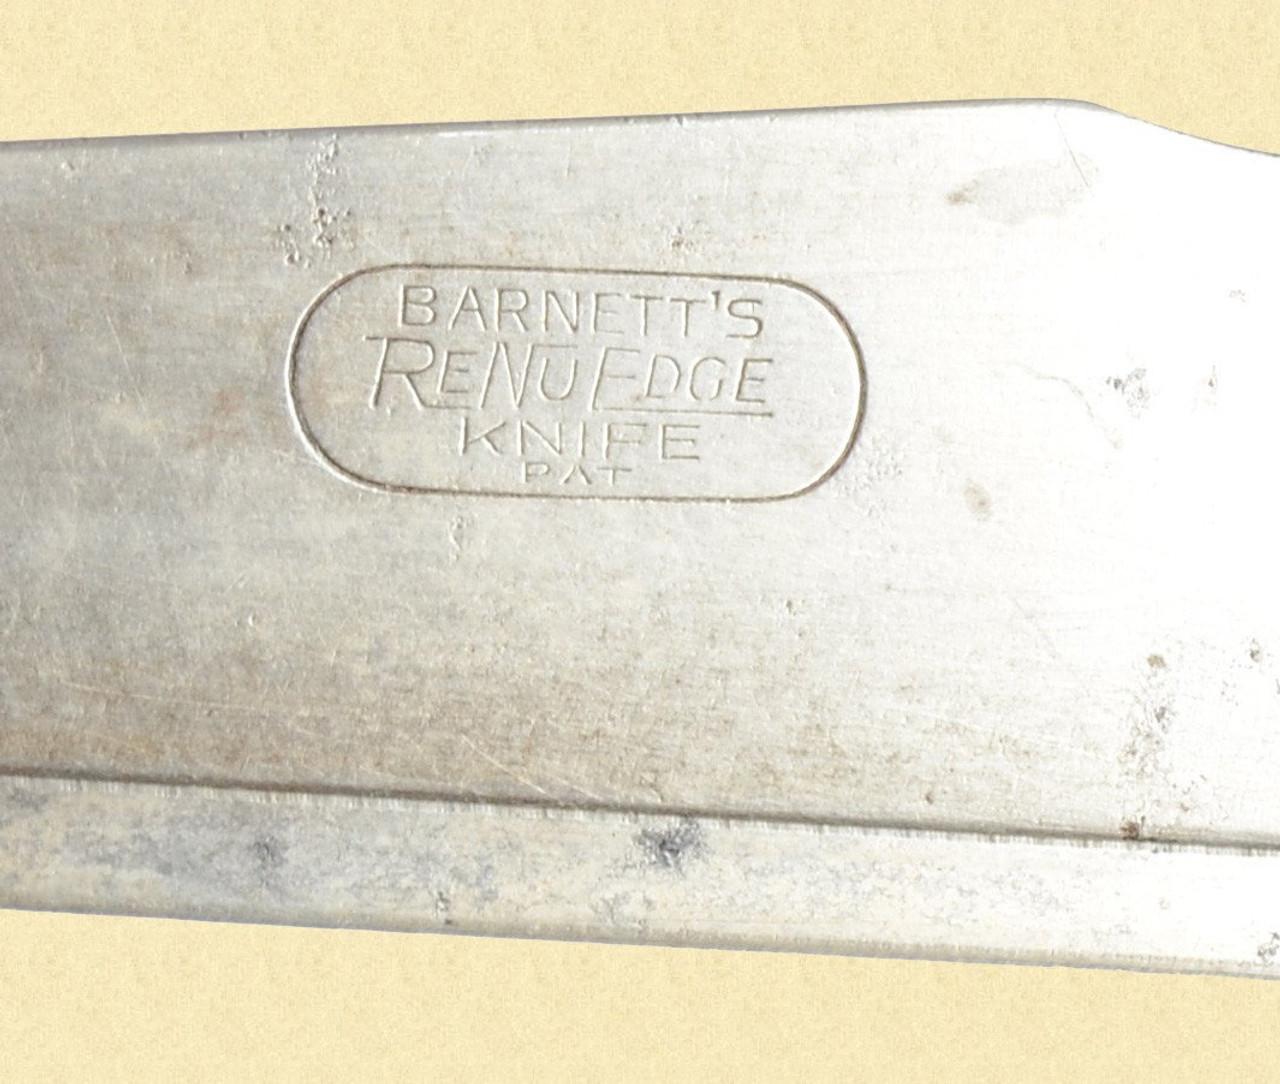 BARNETTS RENUEDGE KNIFE - C24882